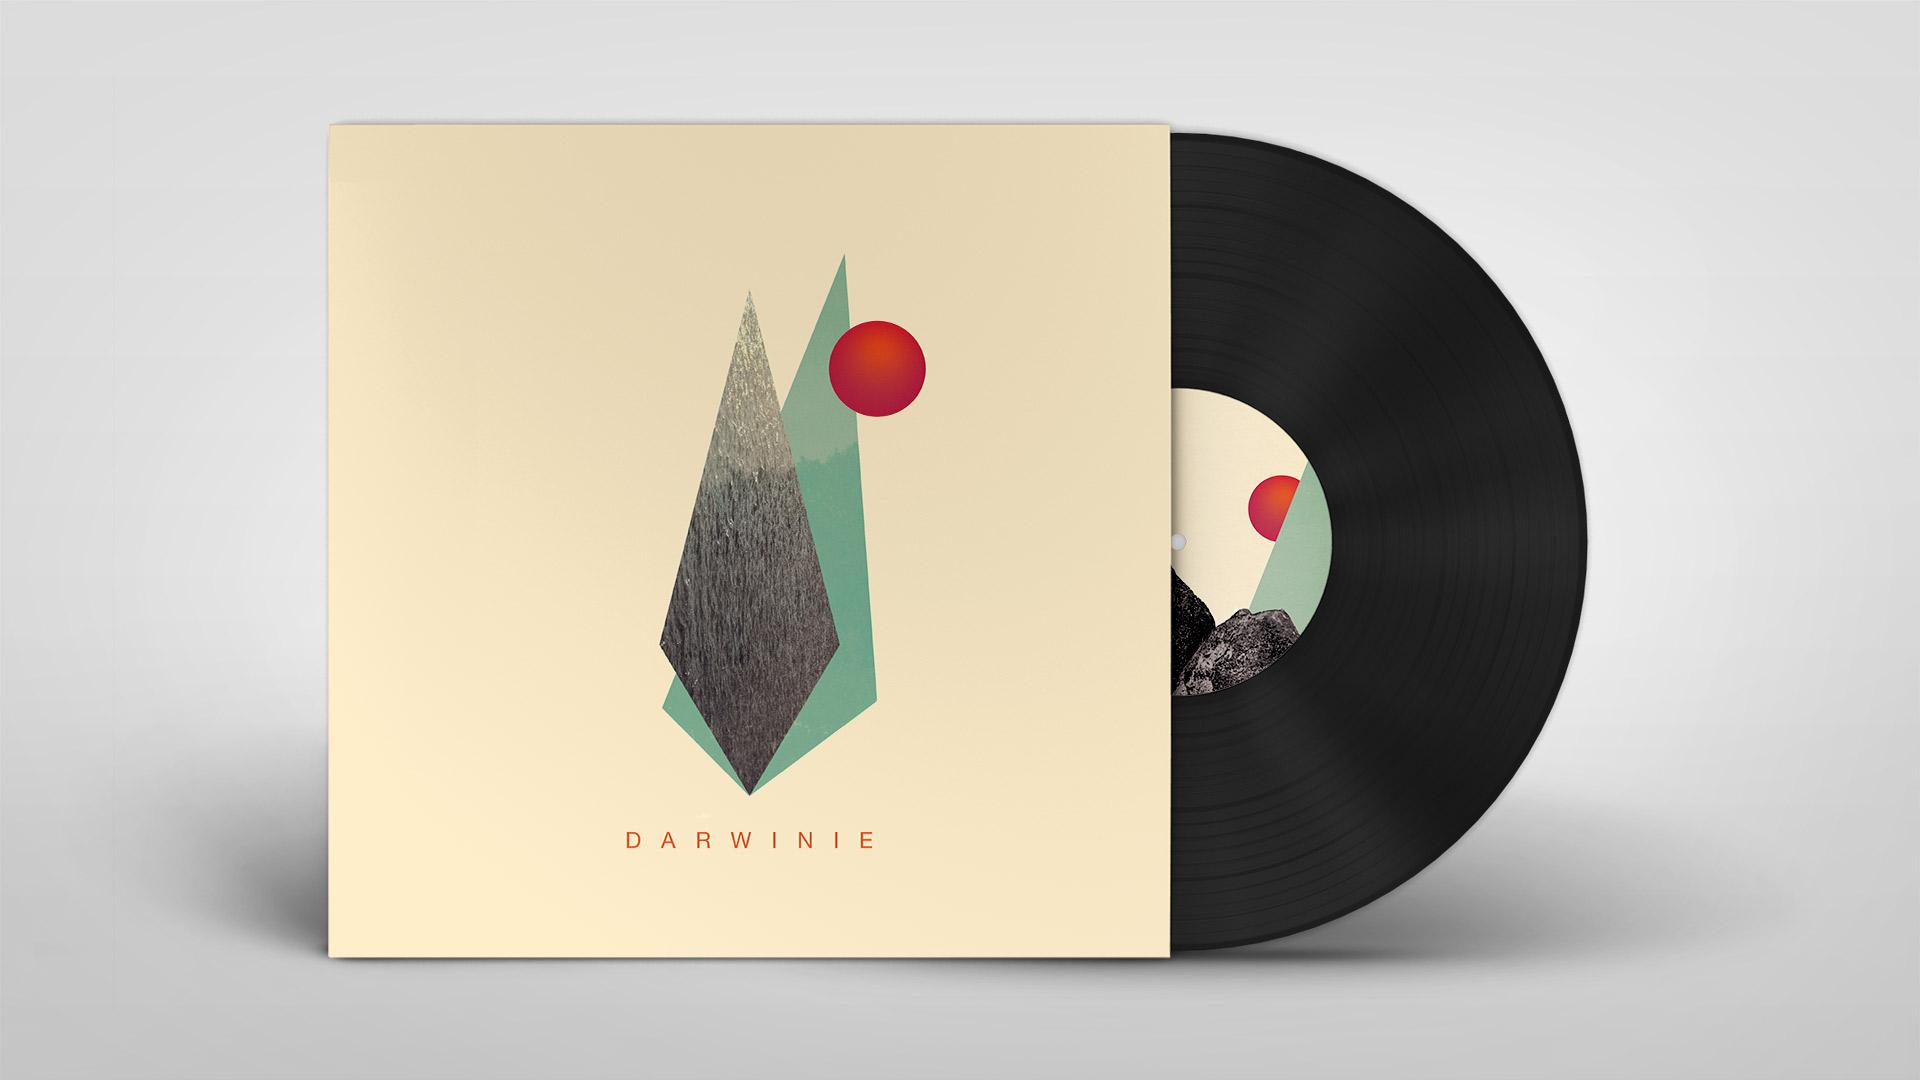 Darwinie / Unused Concept